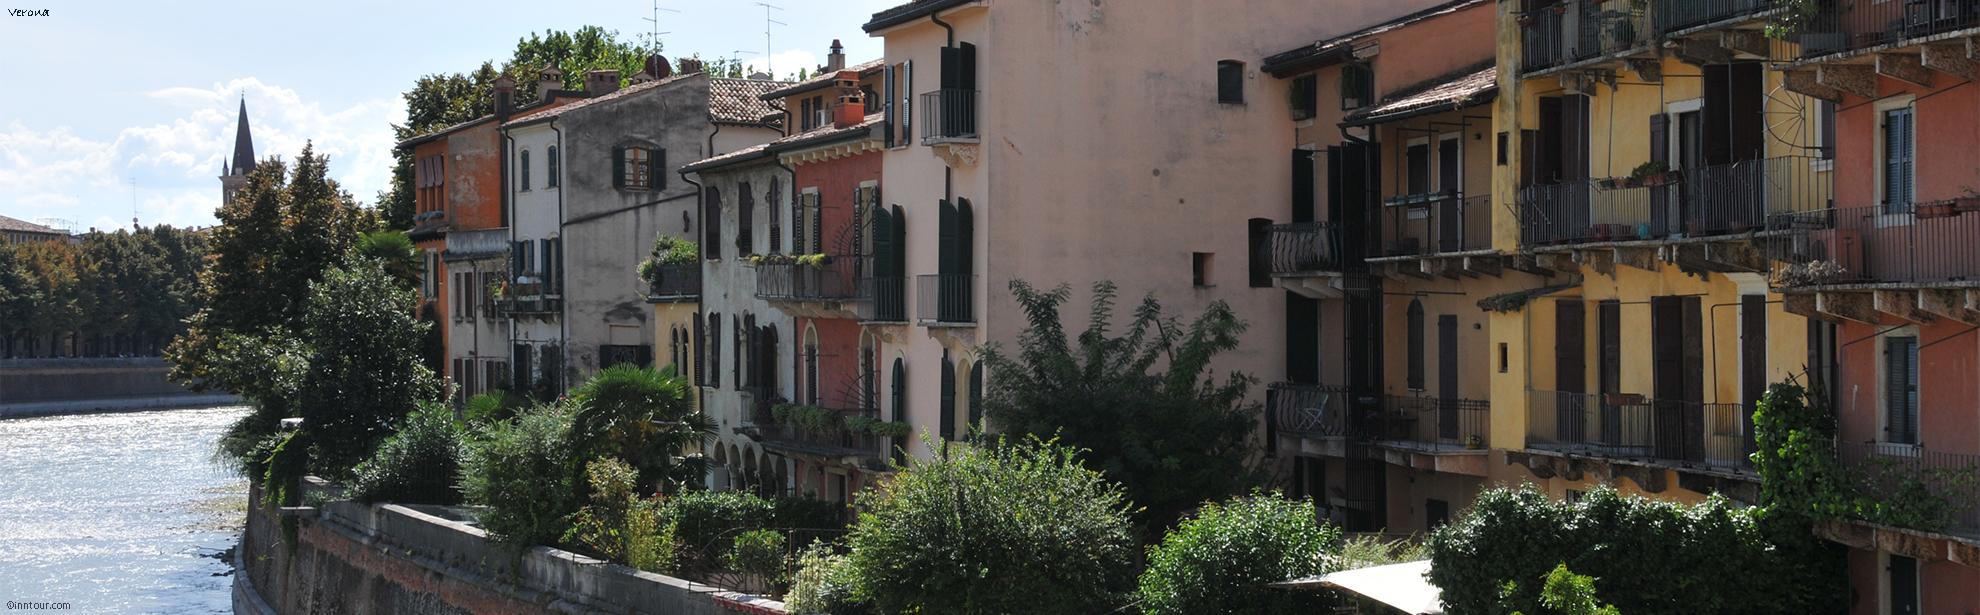 Osportinntour_Verona_DSC_1005